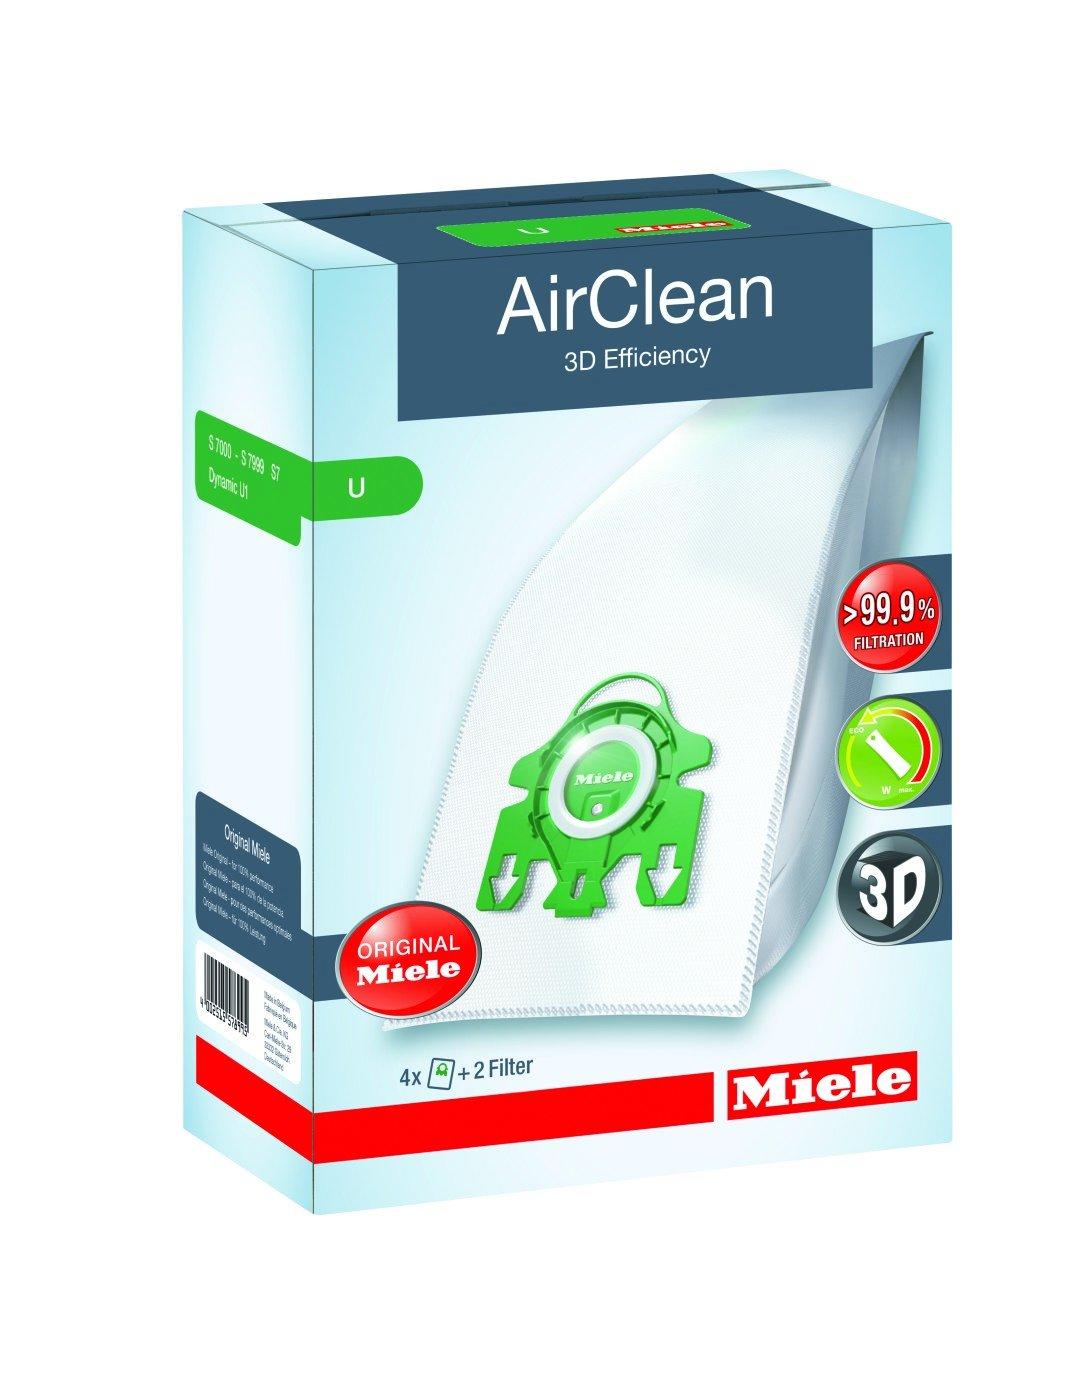 MIELE U AirClean 3D Efficiency FilterBags